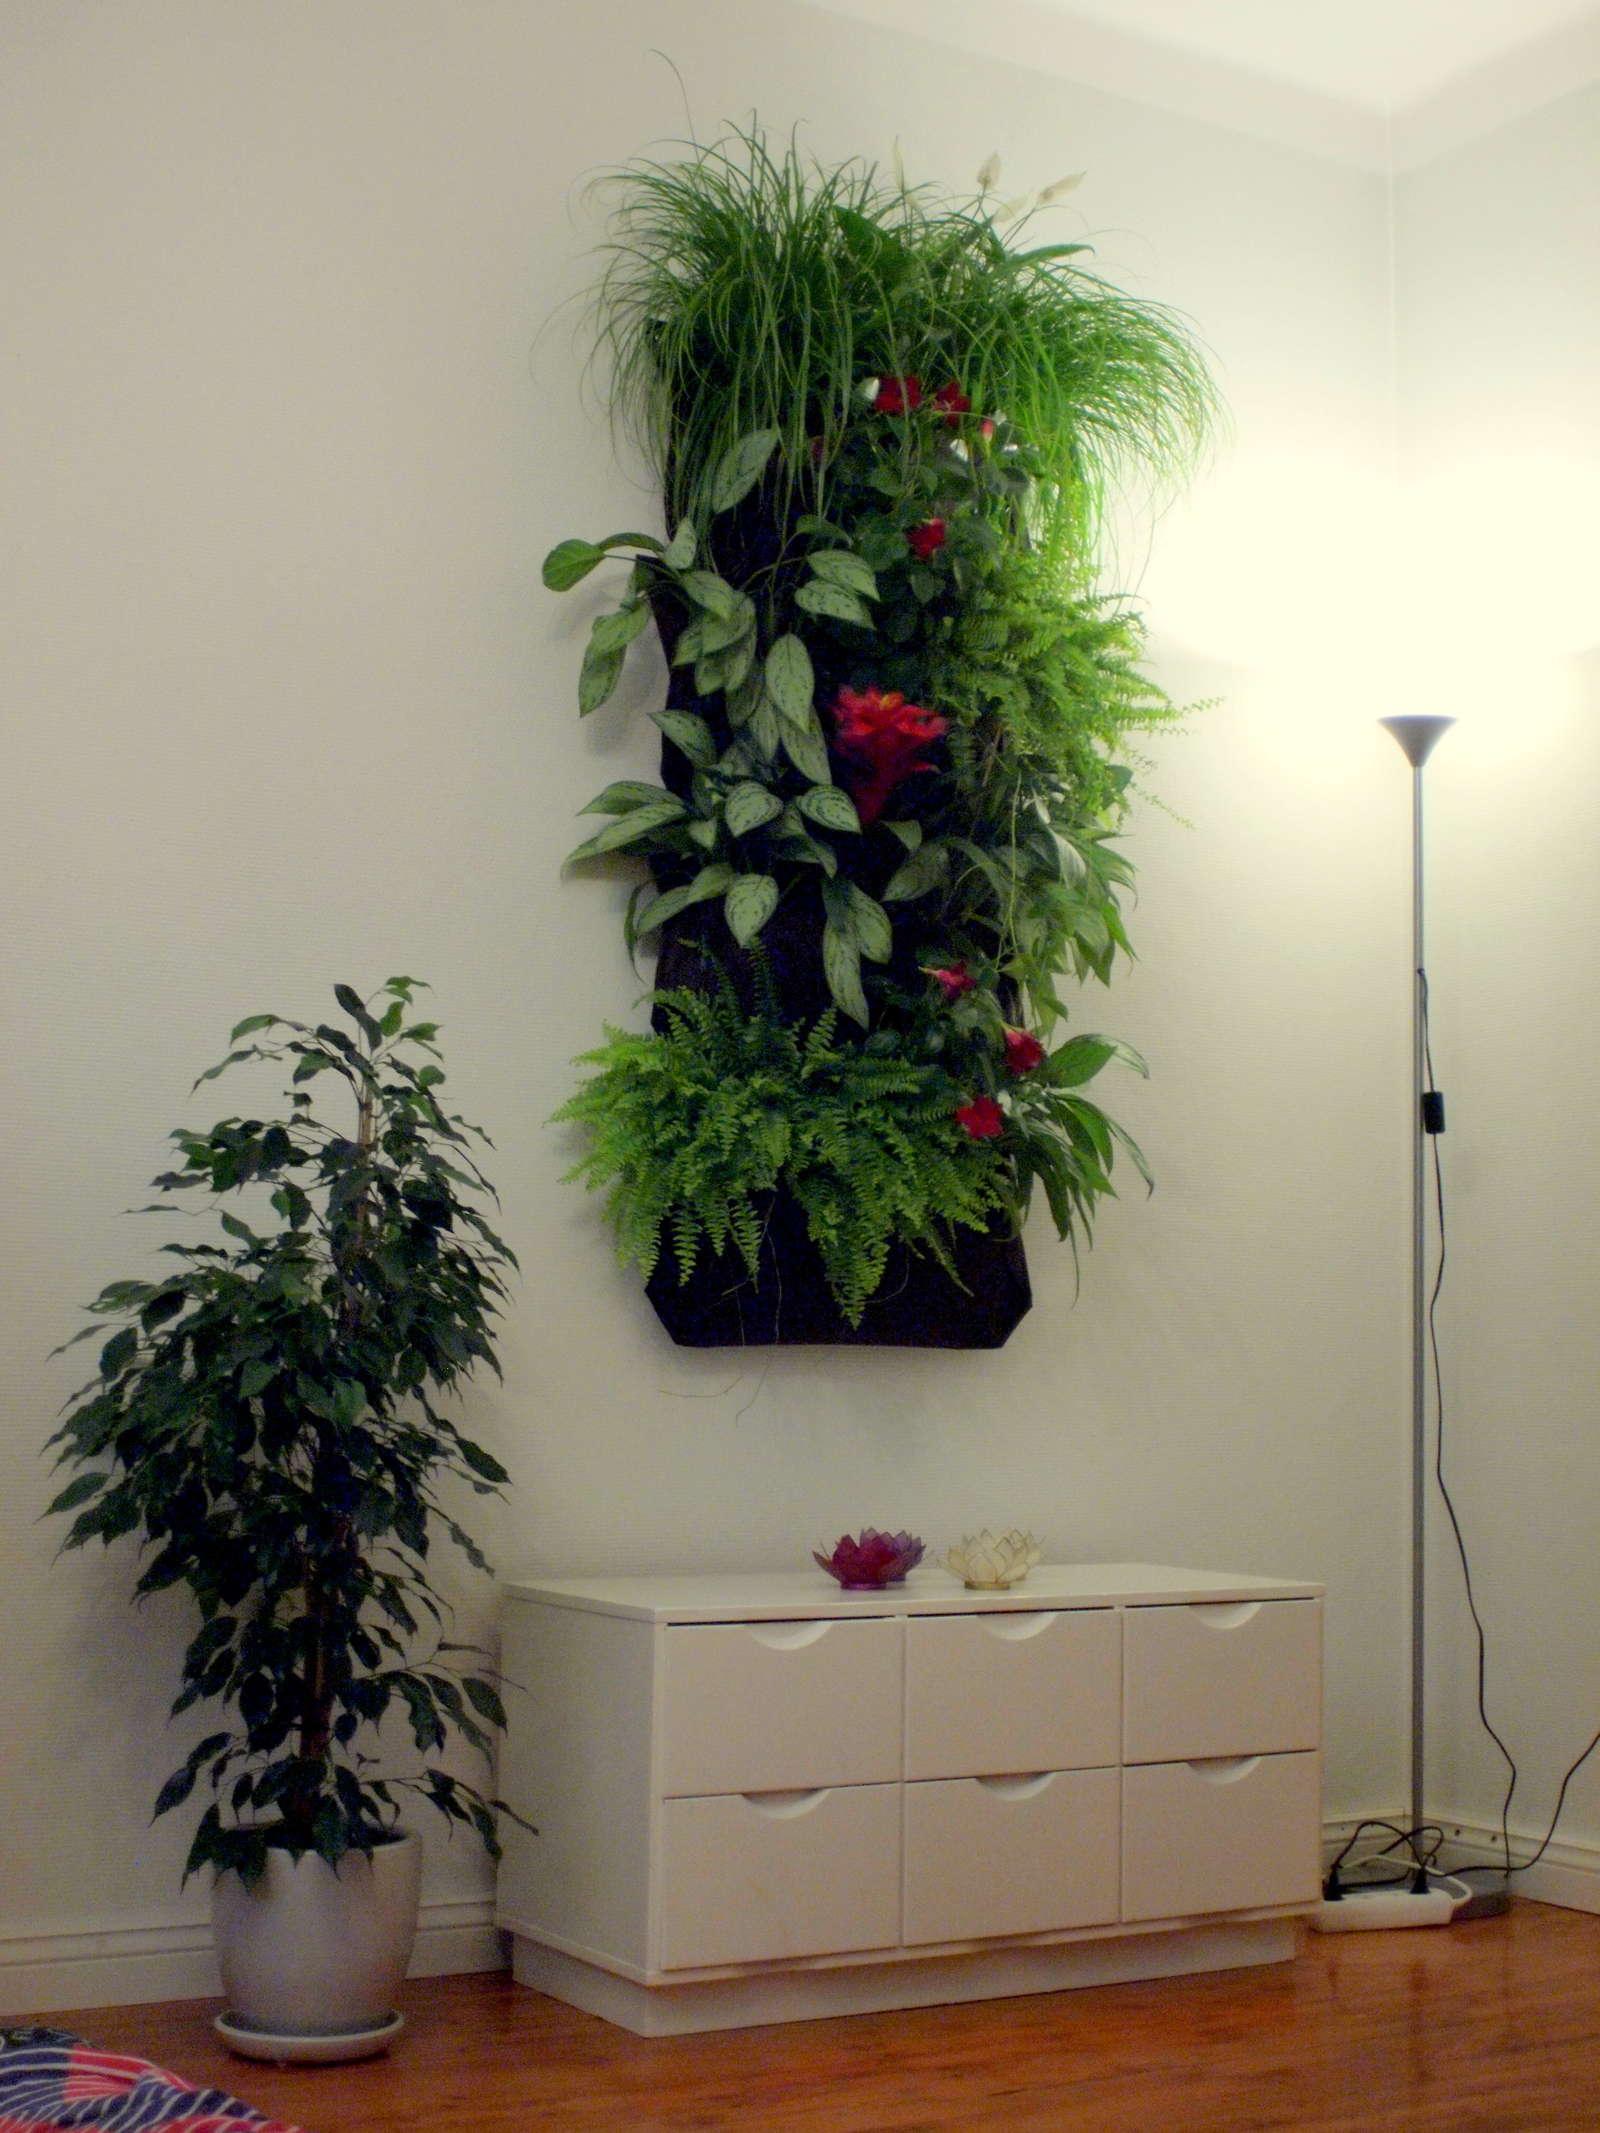 Vertikal Gärten vertikaler garten gärten bis in luftige höhen anlegen plantura